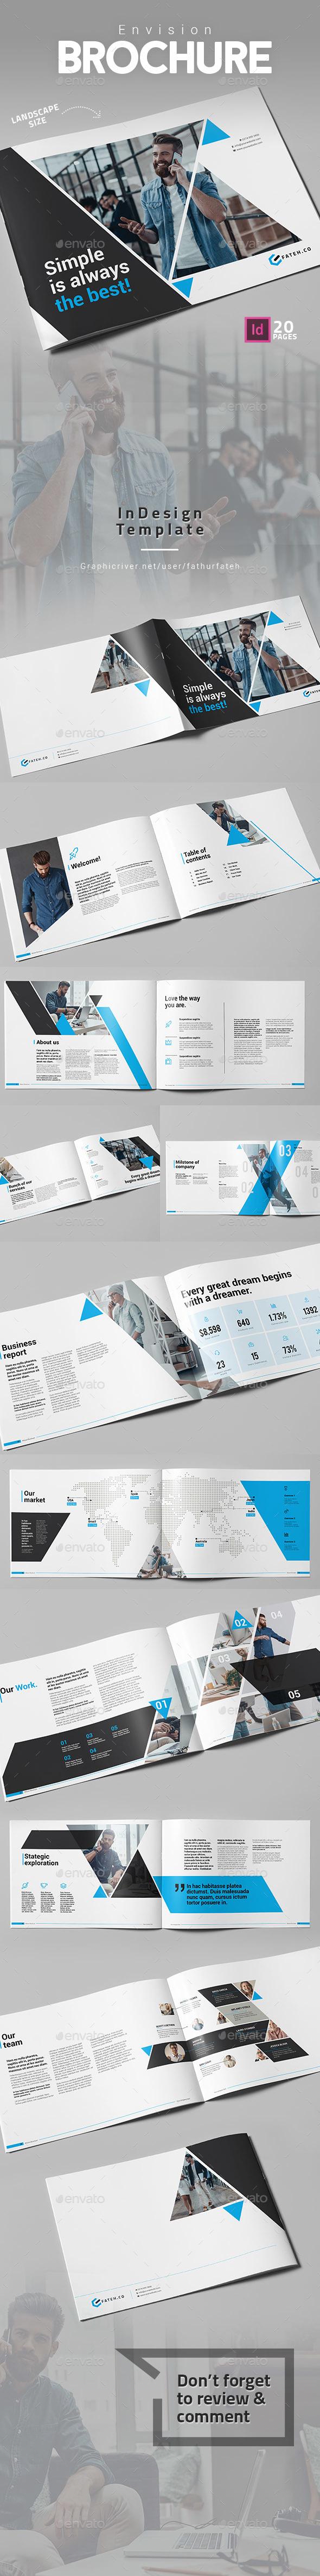 GraphicRiver Envision Brochure Landscape 21069979